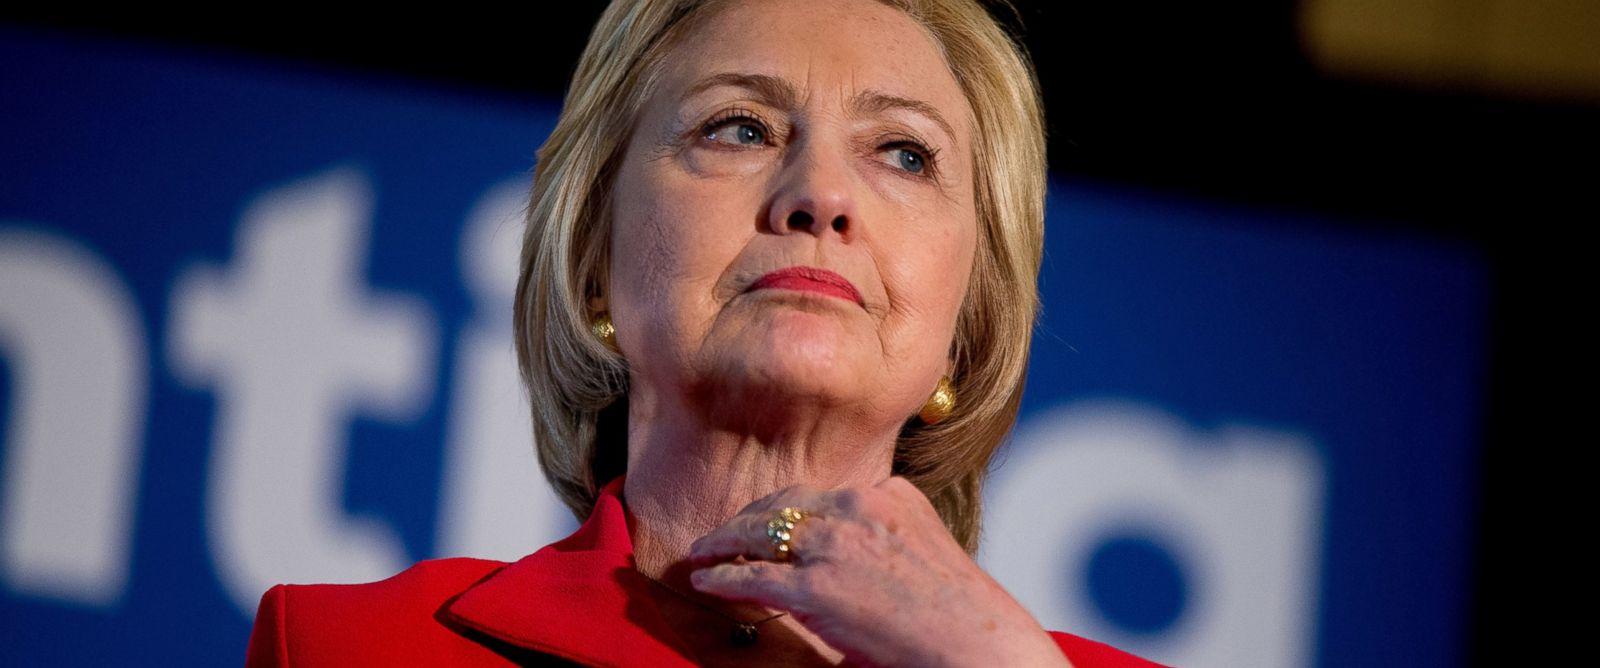 Ap Hillary Clinton Jt 160522 12x5 1600 Jpg. Related Gallery: Wedding Ring  ...